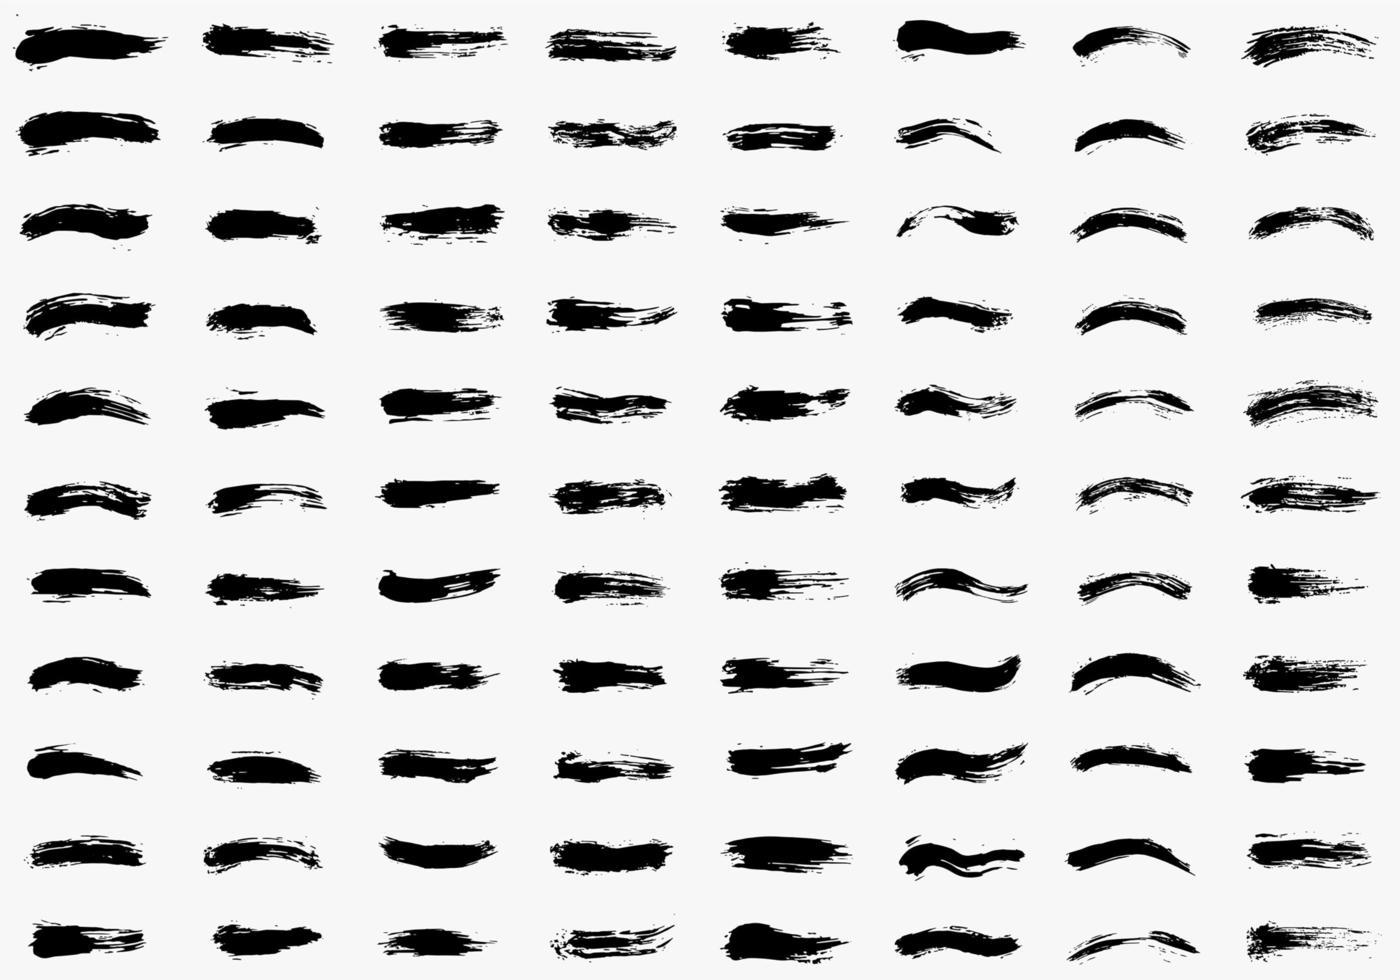 conjuntos de pinceladas dibujadas a mano vector